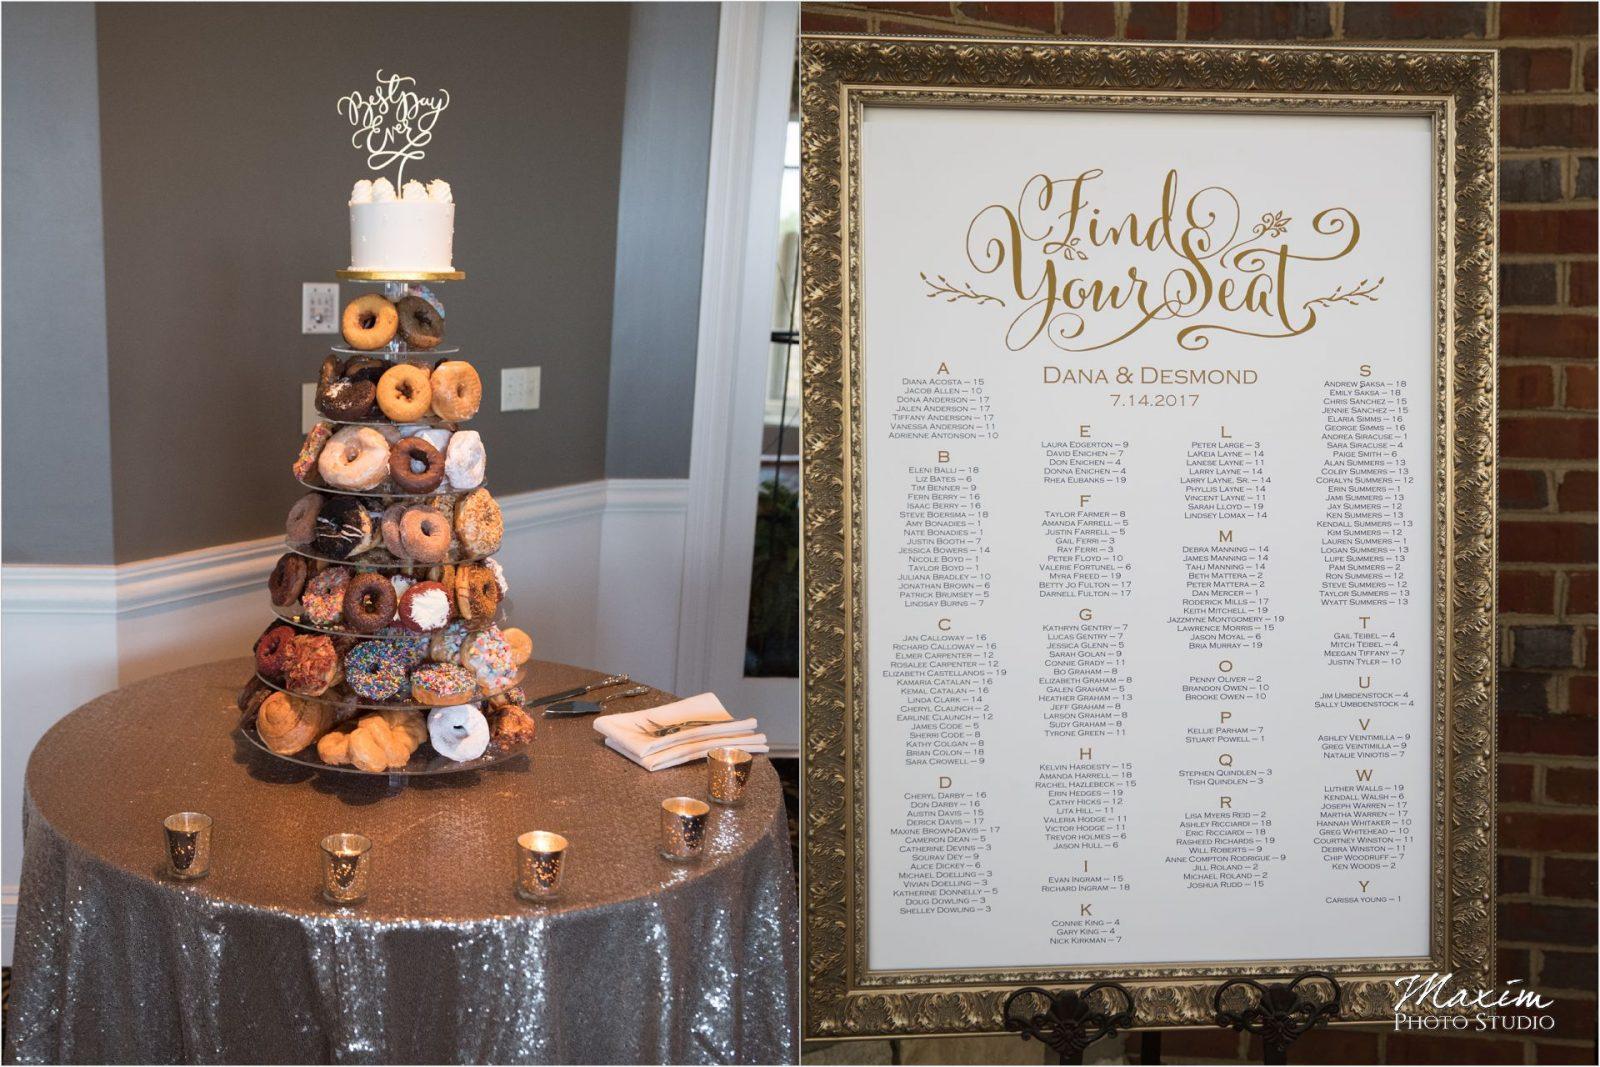 Holtman's Donuts Drees Pavilion Wedding Cake